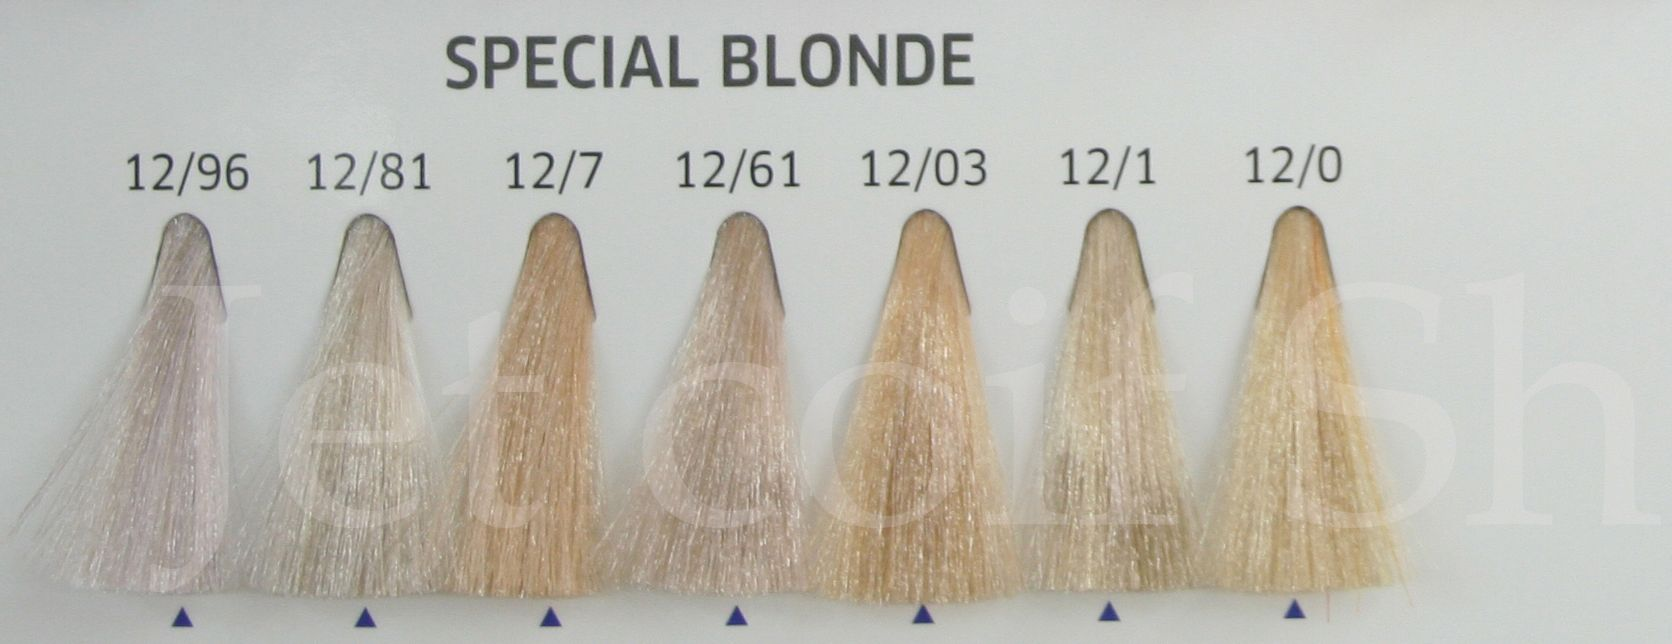 Les Blonds Jpg 1 672 644 Pixels Wella Koleston Hair Color Platinum Hair